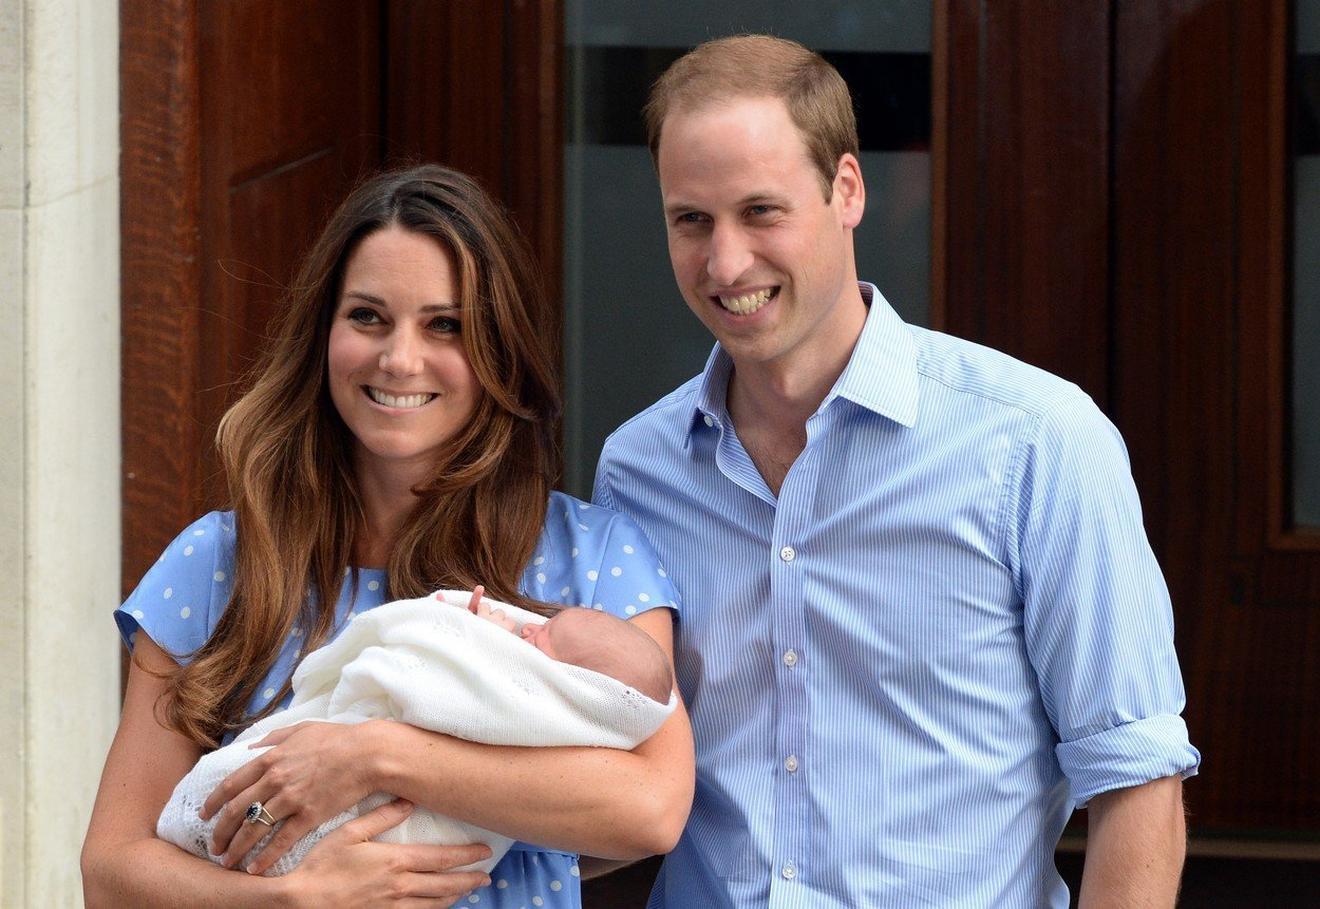 Kejt i Vilijam sa princom Džordžem 2013.  ispred bolnice